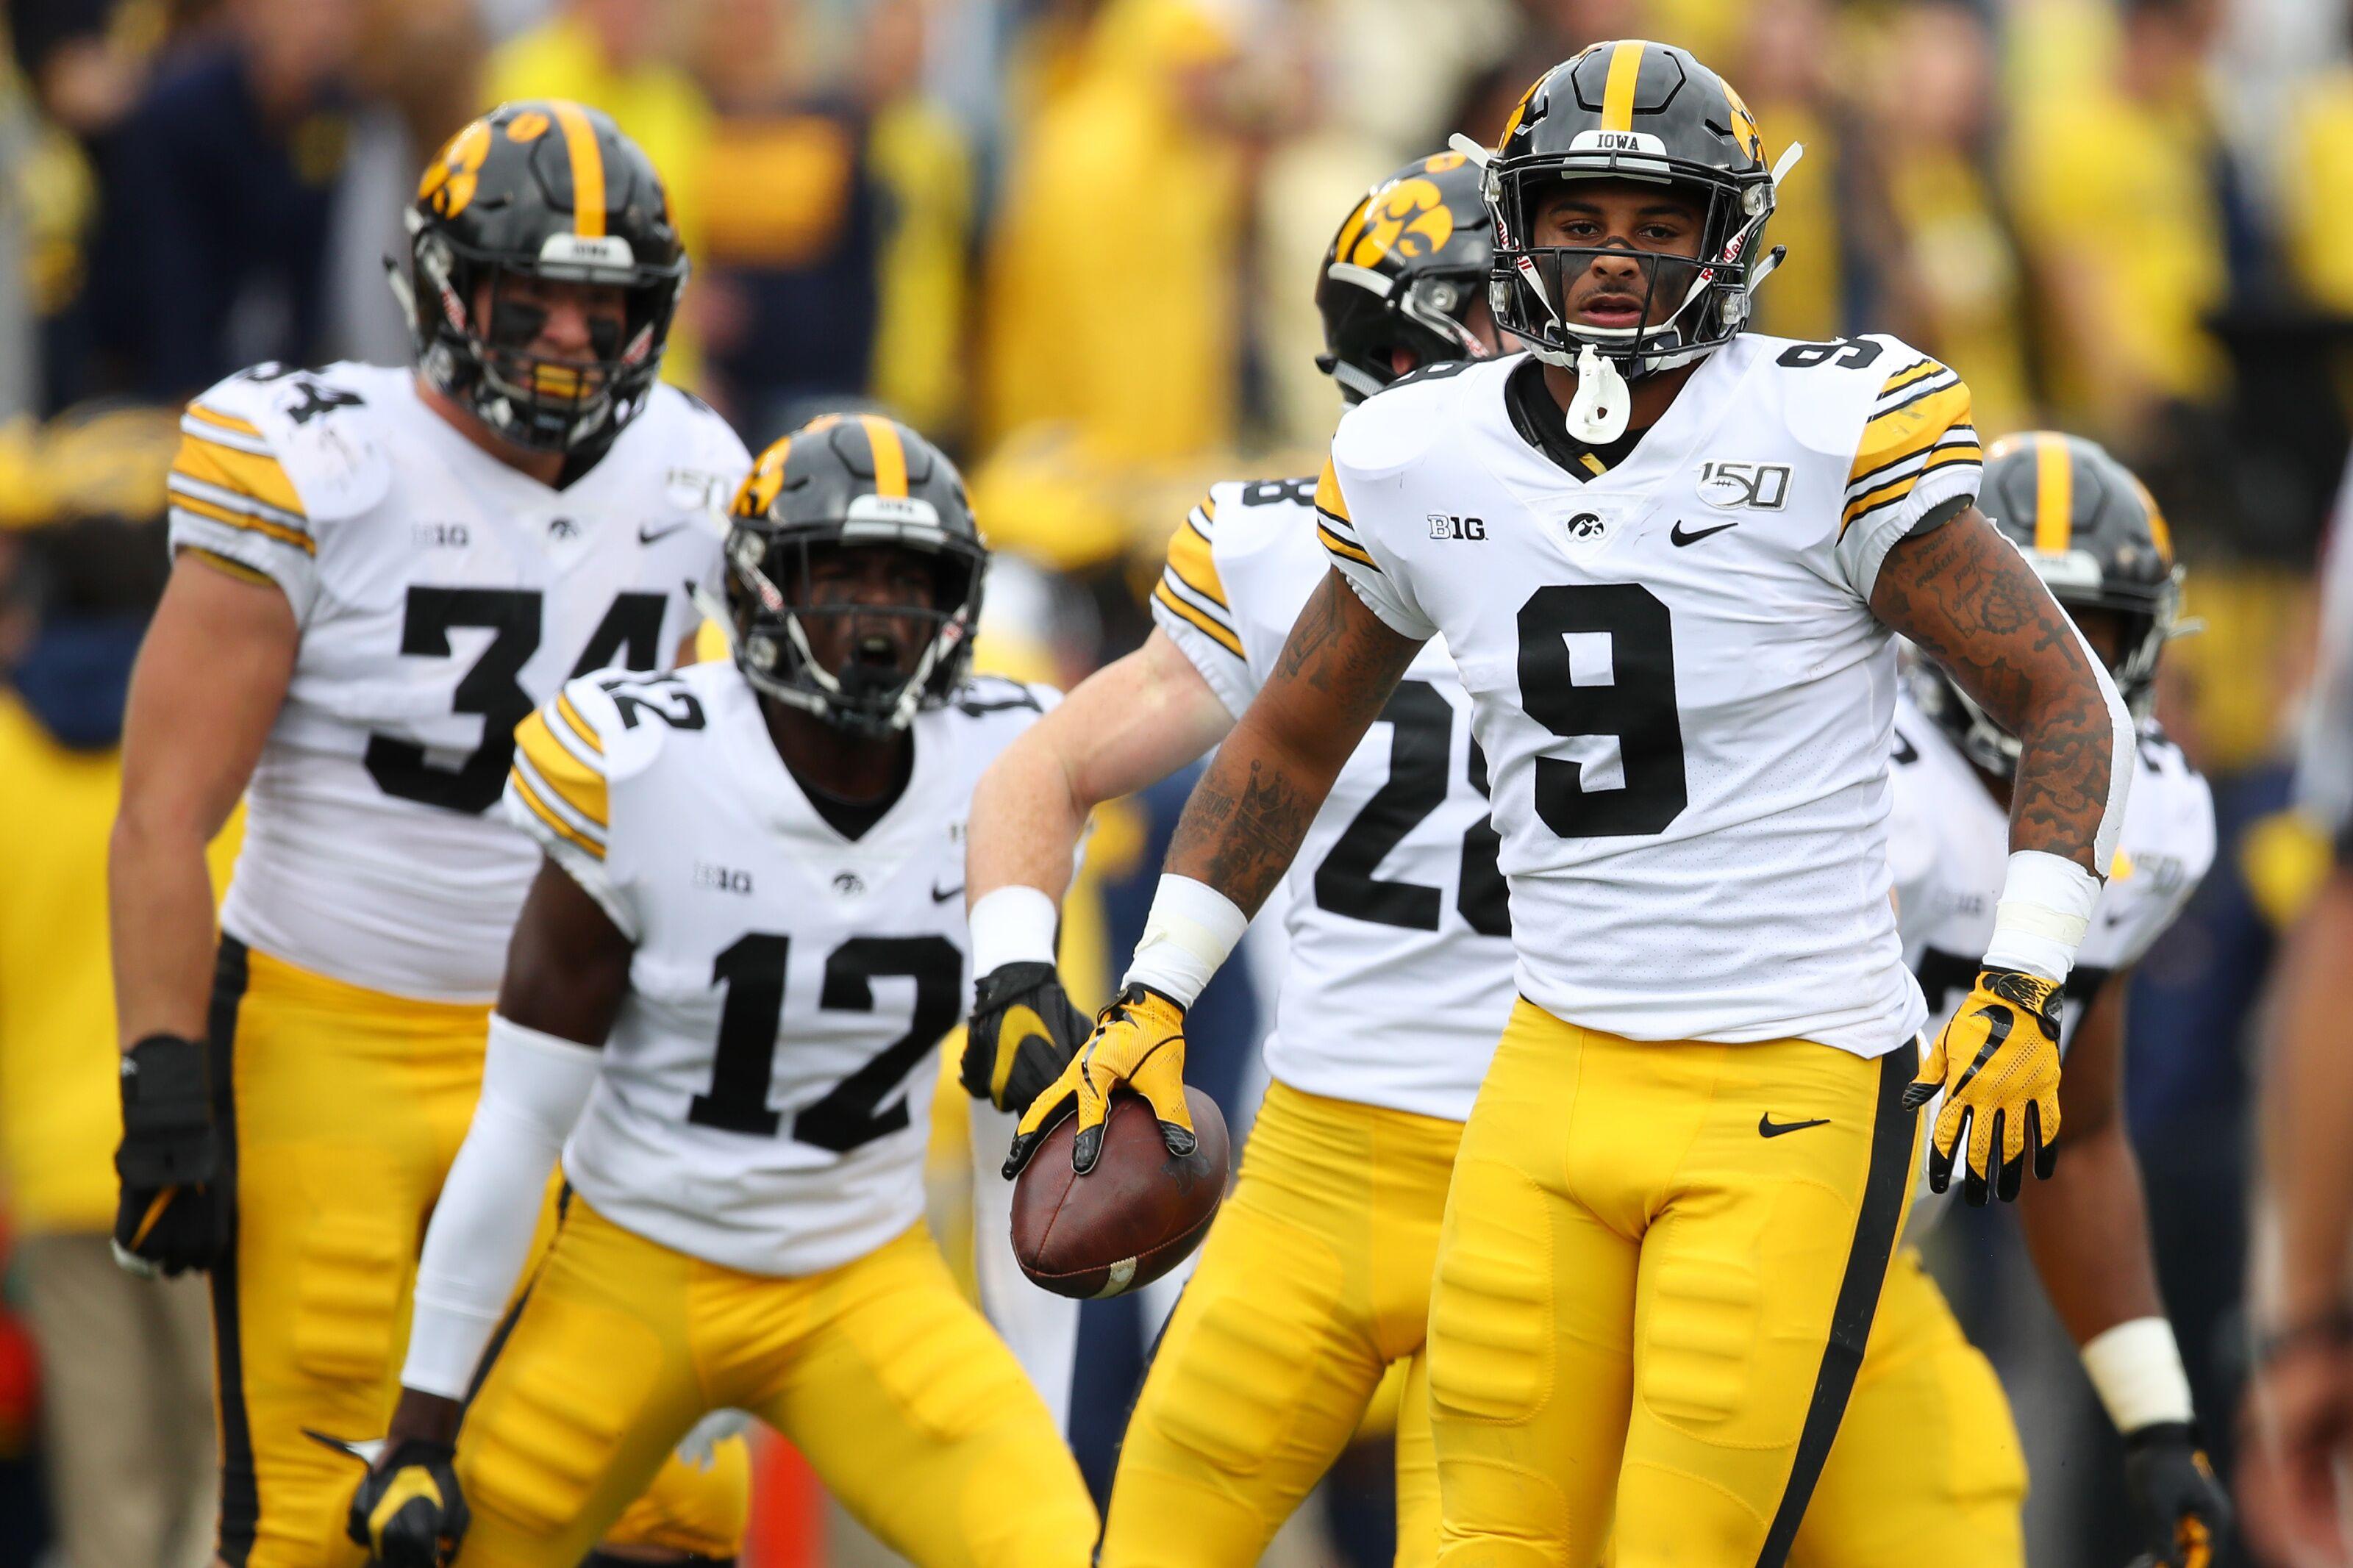 Iowa football: Hawks get no love in midseason All-American team